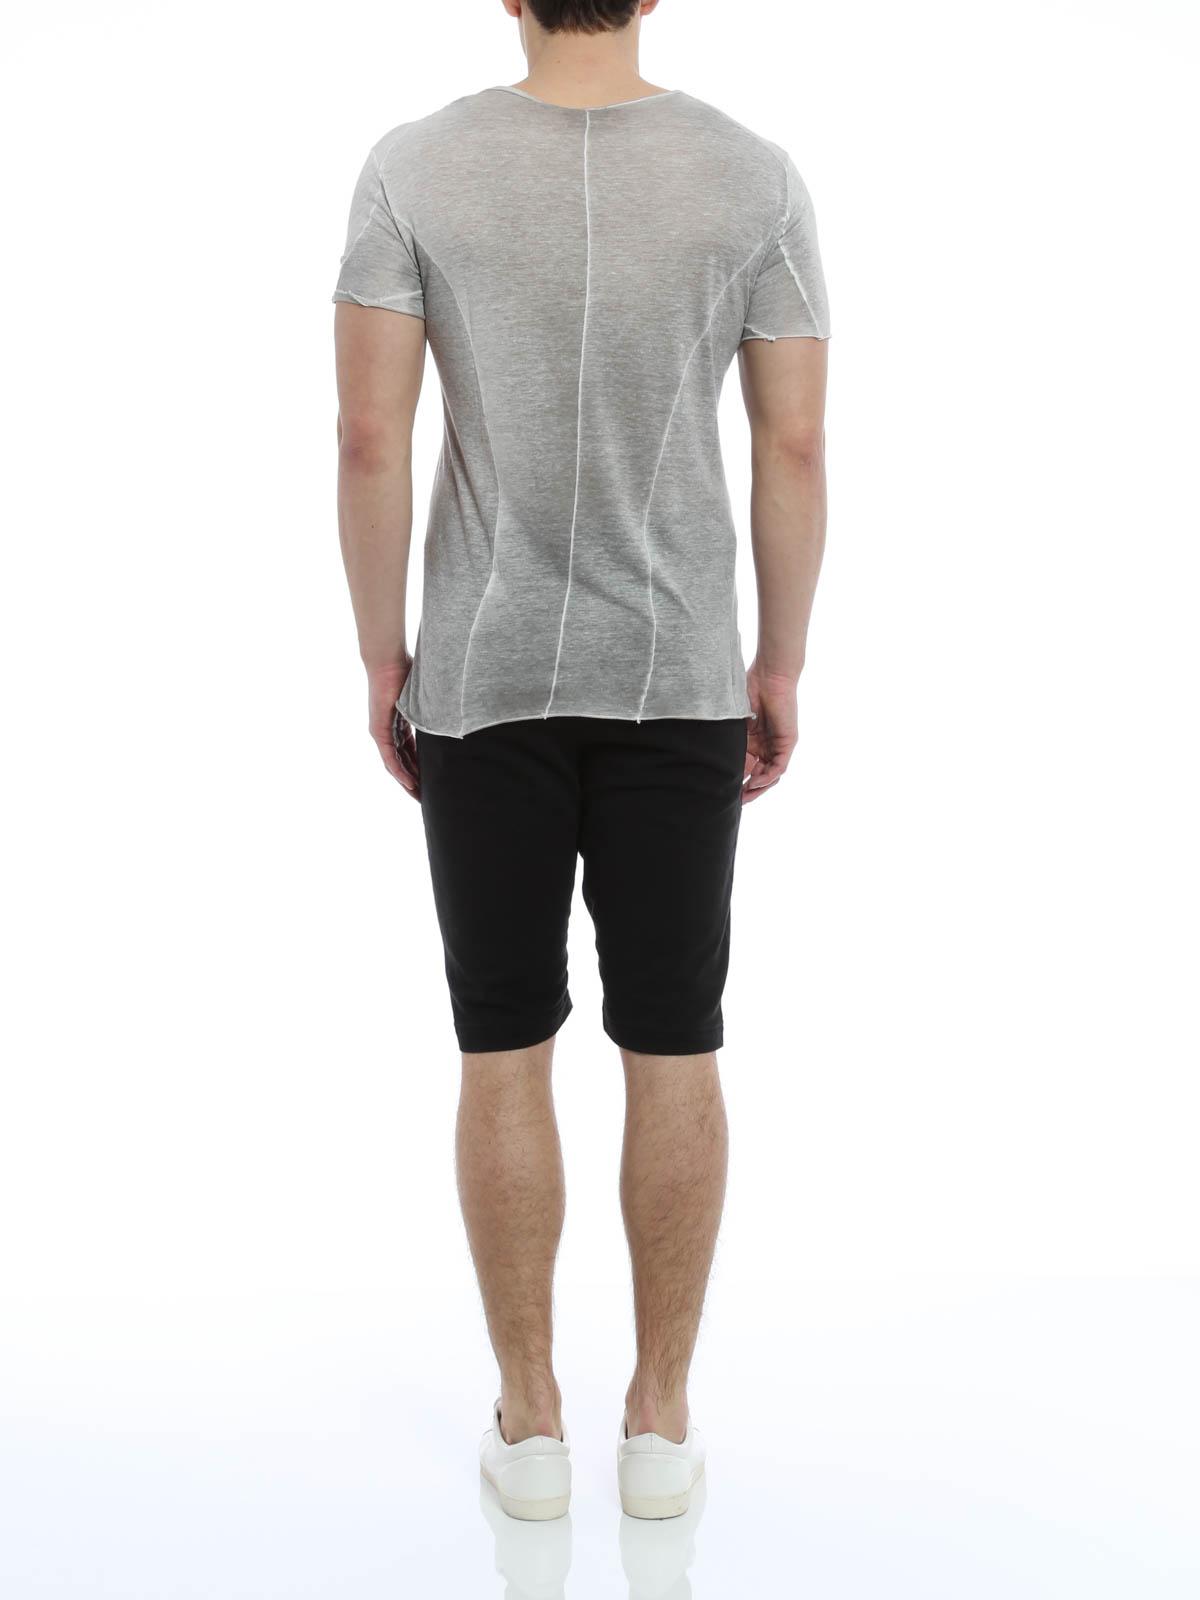 V neck t shirt by avant toi t shirts ikrix for V neck t shirt online shopping